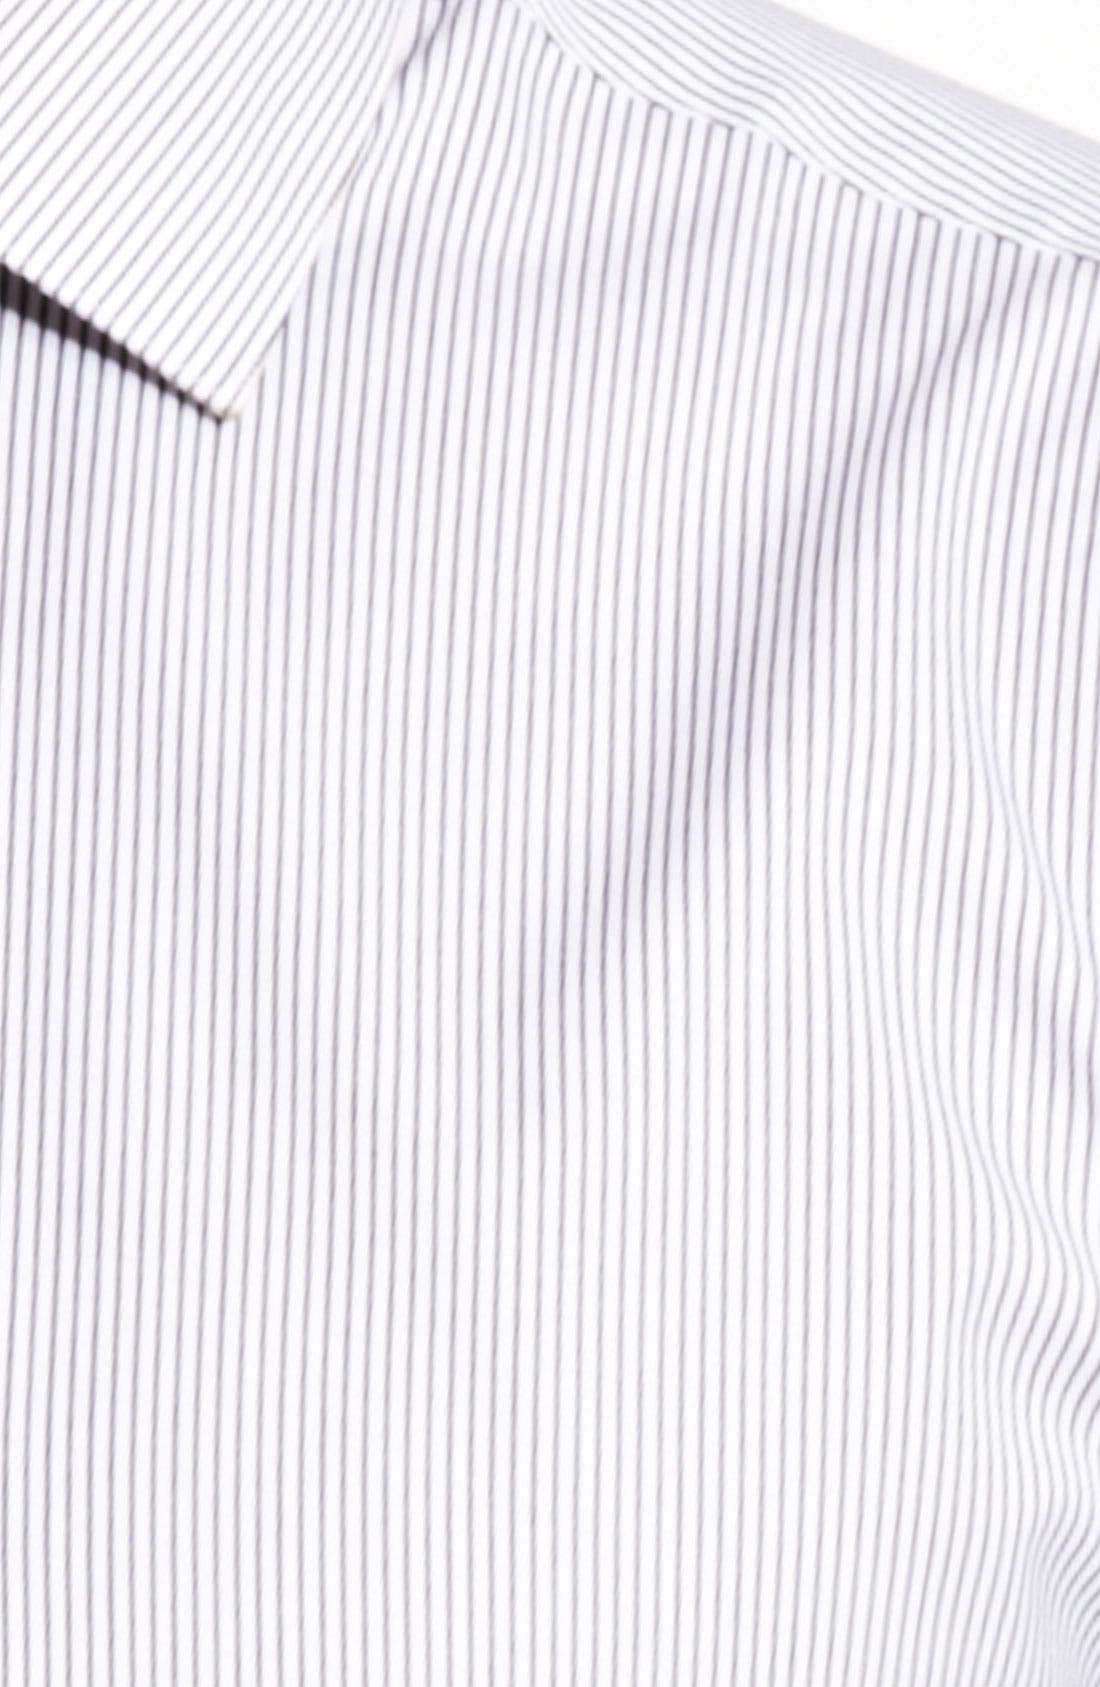 Trim Fit Stripe Dress Shirt,                             Alternate thumbnail 4, color,